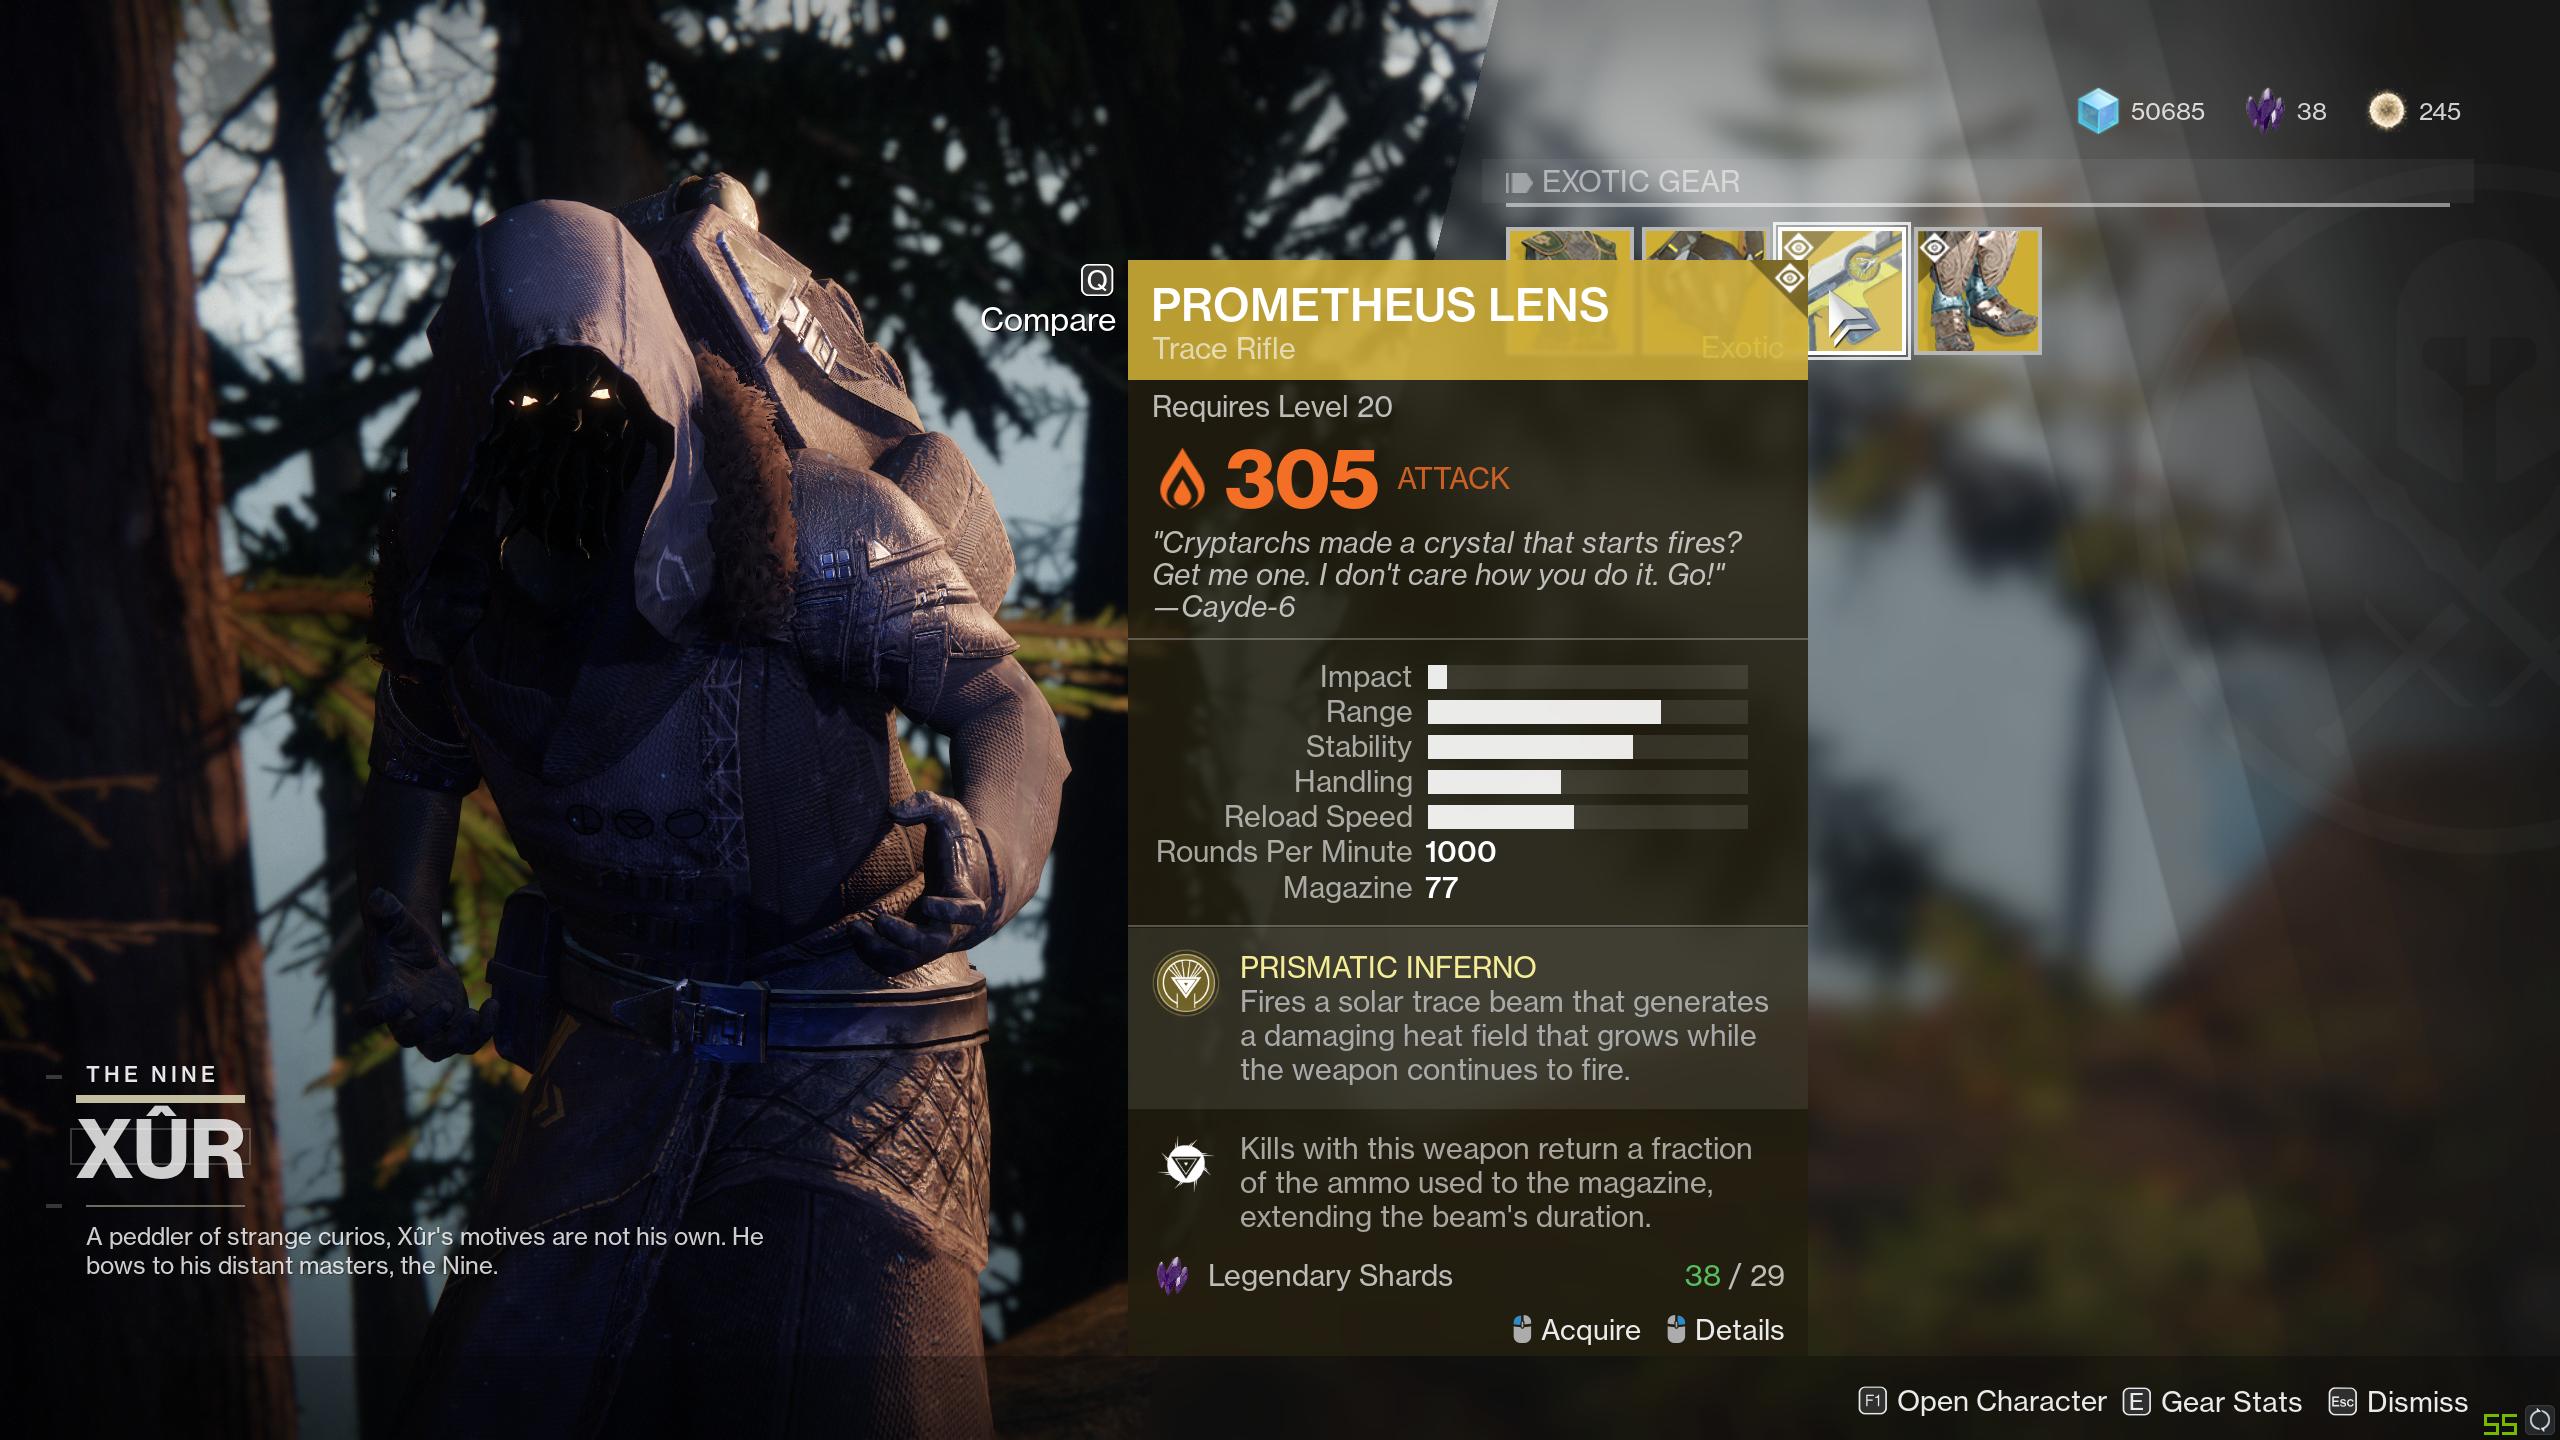 LMFAO Xur Is Selling The Prometheus Lens In Destiny 2